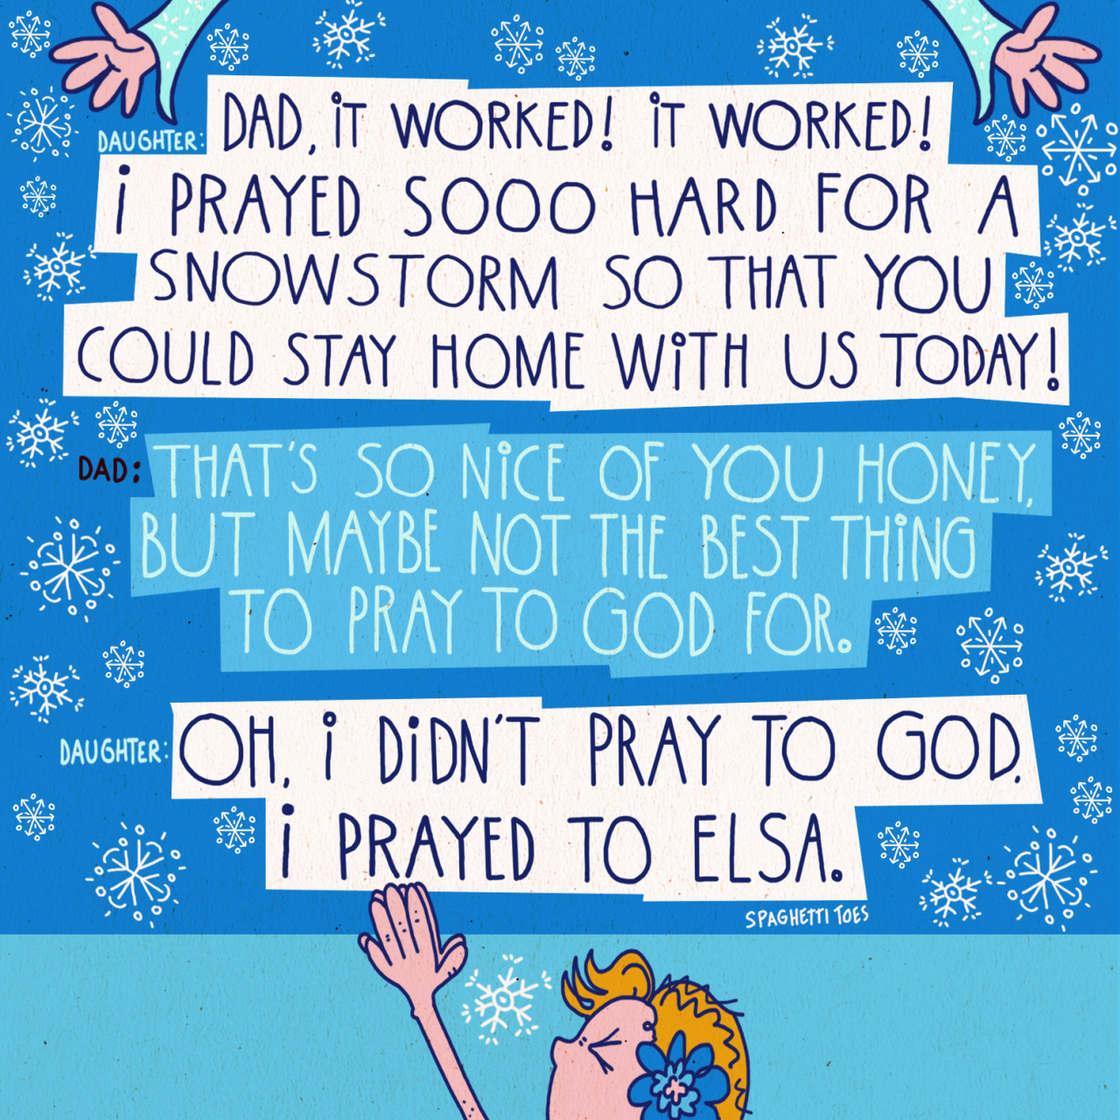 Ce Papa creatif continue d'illustrer les phrases hilarantes de sa petite fille